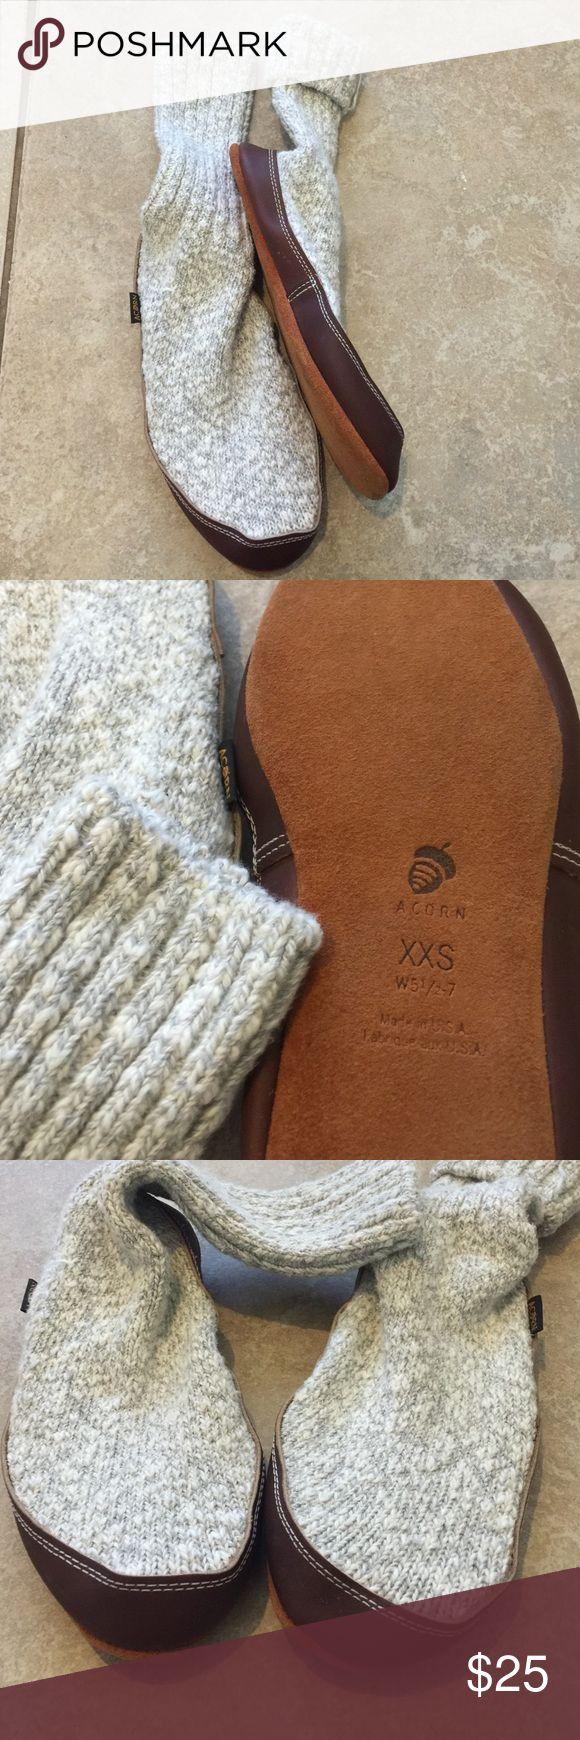 XXS Acorn leather Socks shoes 5 to 7 USA Worn once like new warm socks Acorn Shoes Flats & Loafers